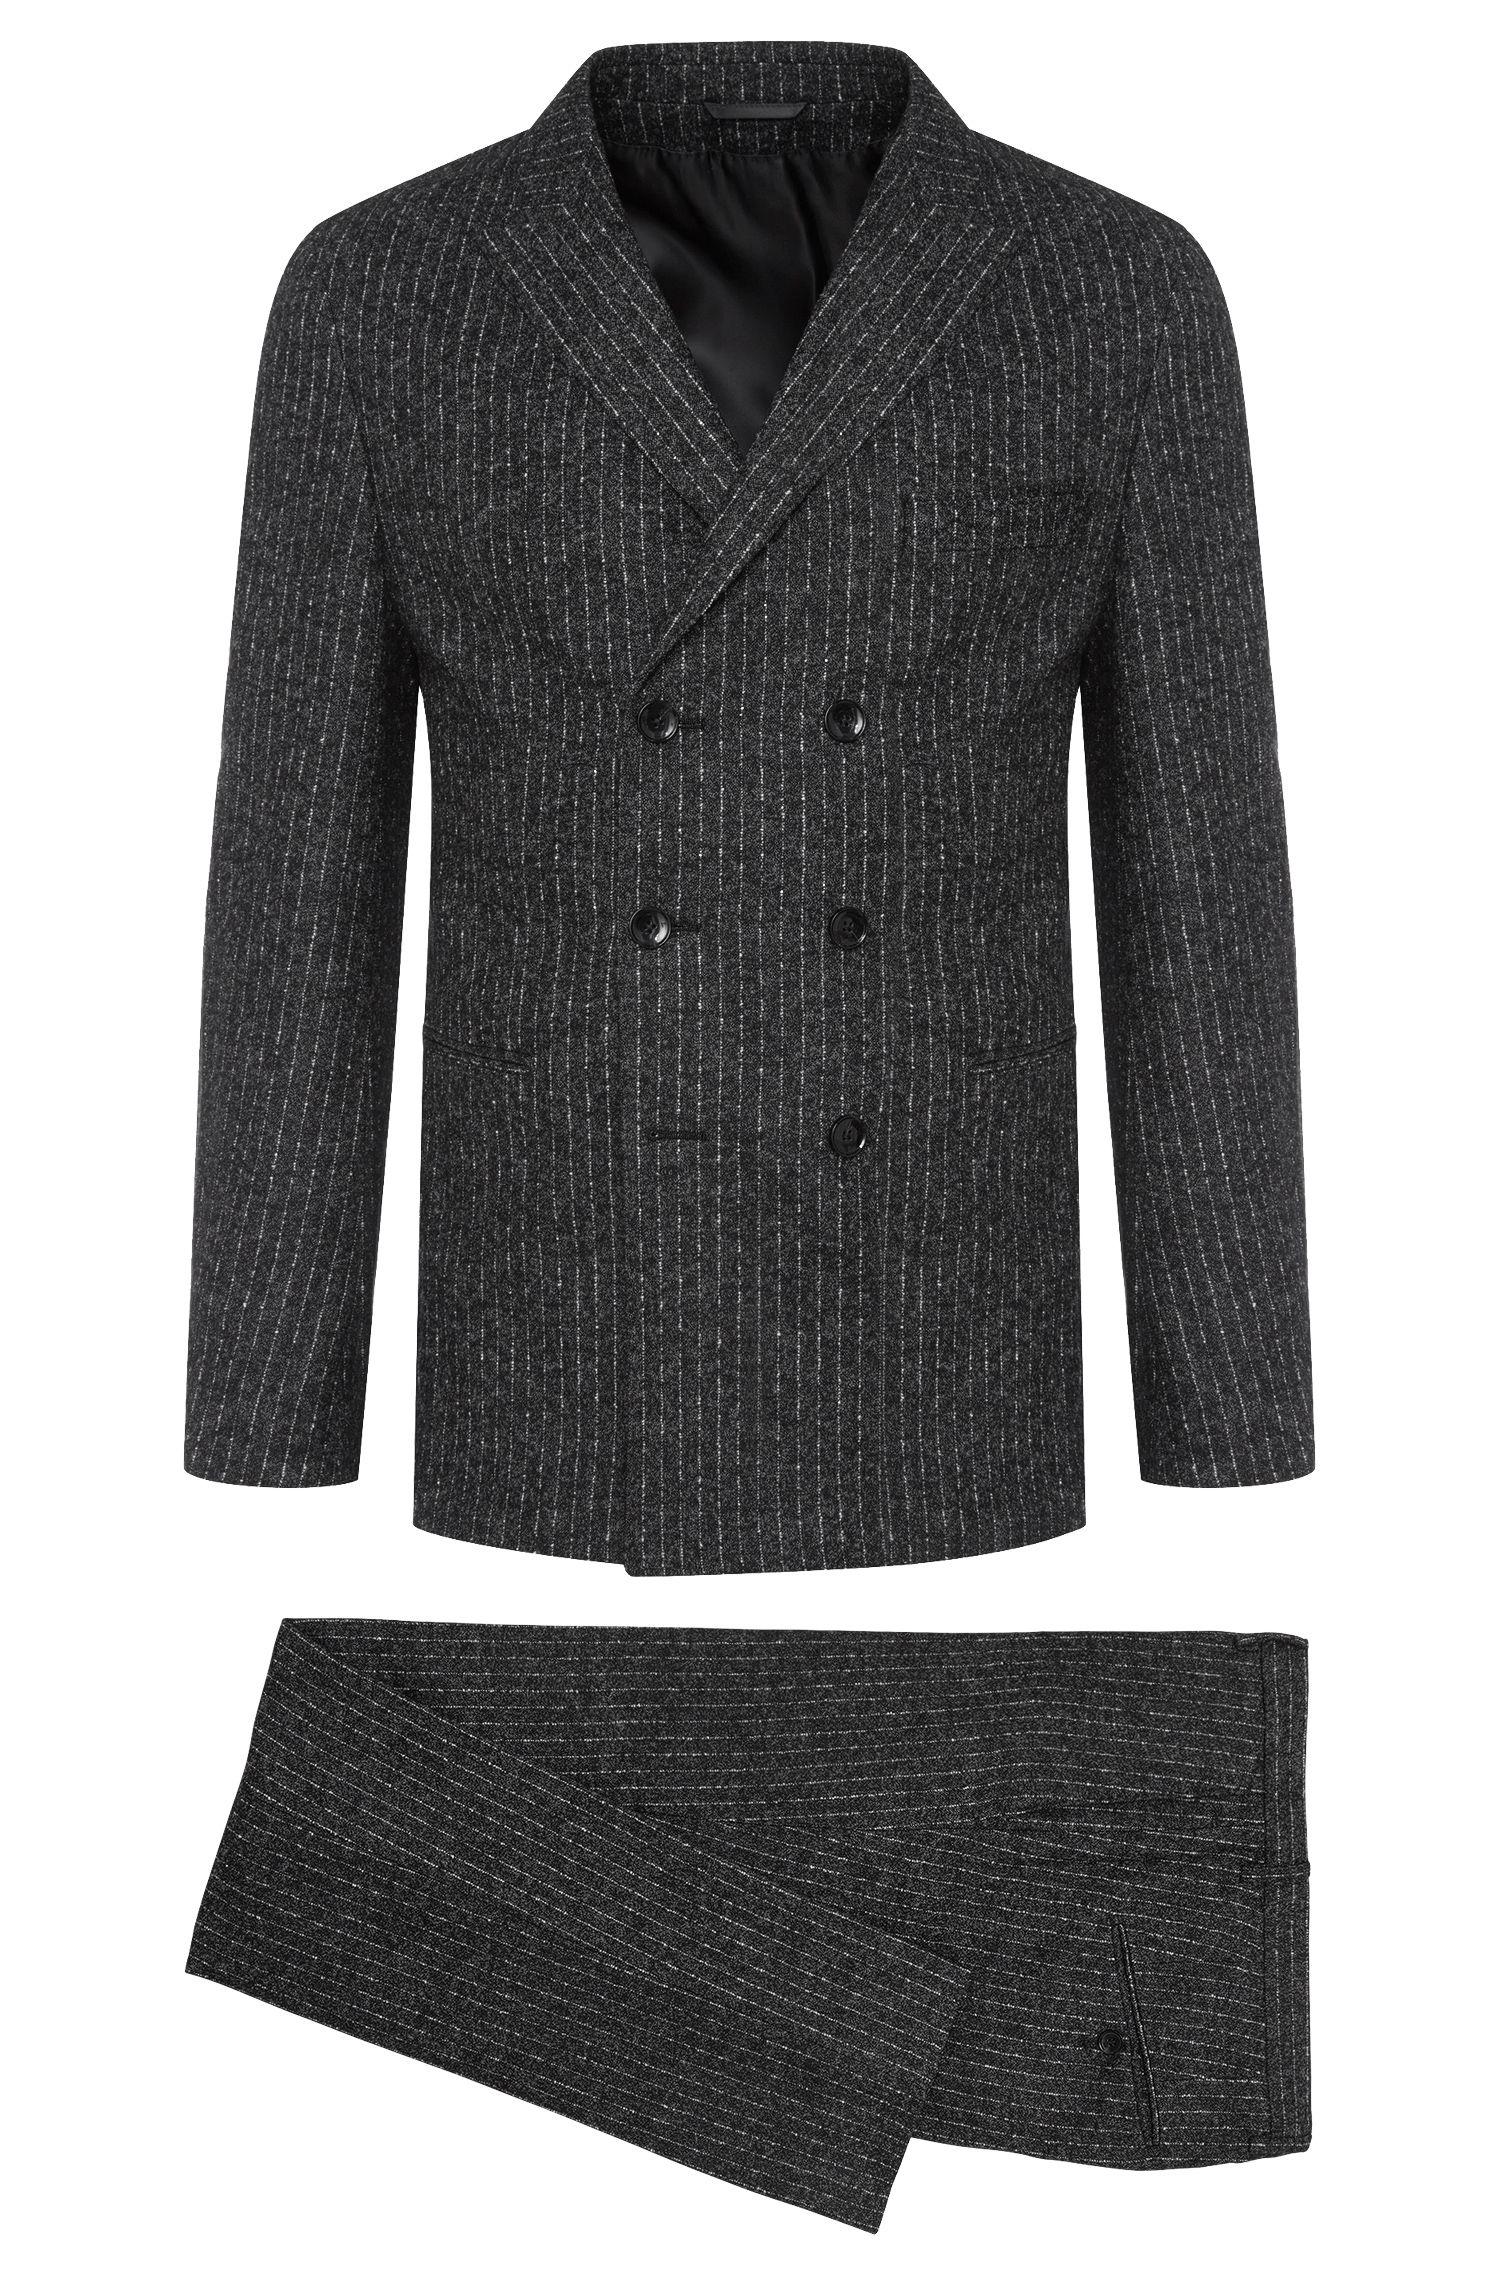 'T-Noan/Baron' | Slim Fit, Italian Alpaca Cotton Blend Suit